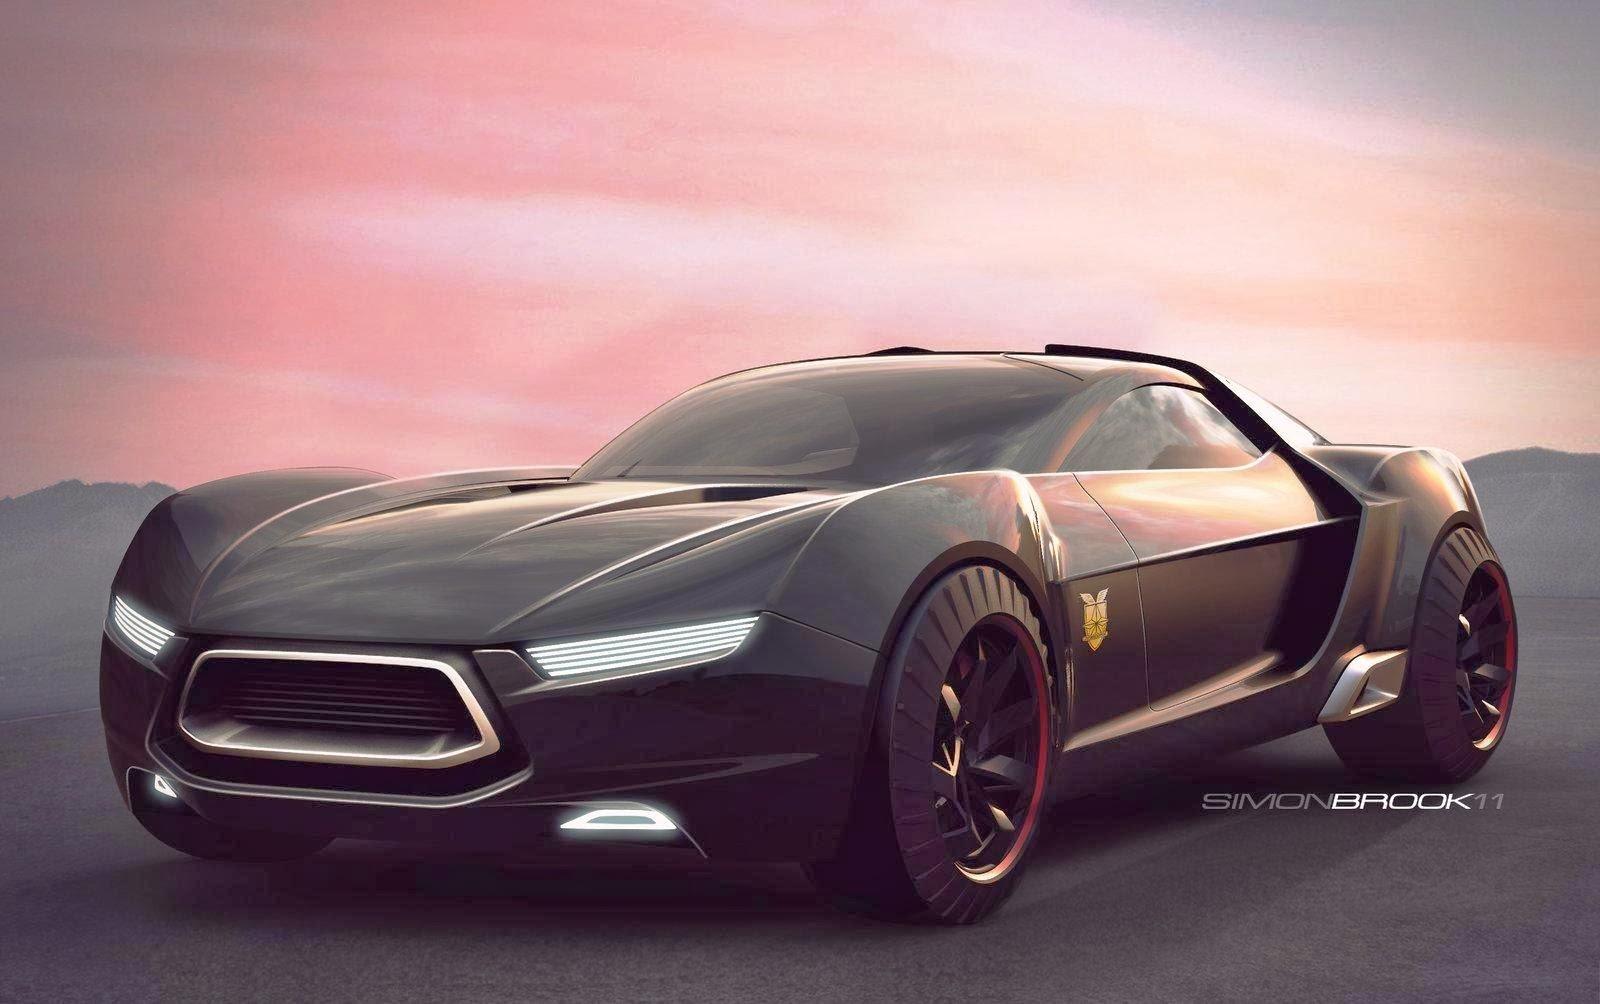 2015 Mustang Mach 1 >> Informative BLOG: 2015 Mustang Mach 5 Concept